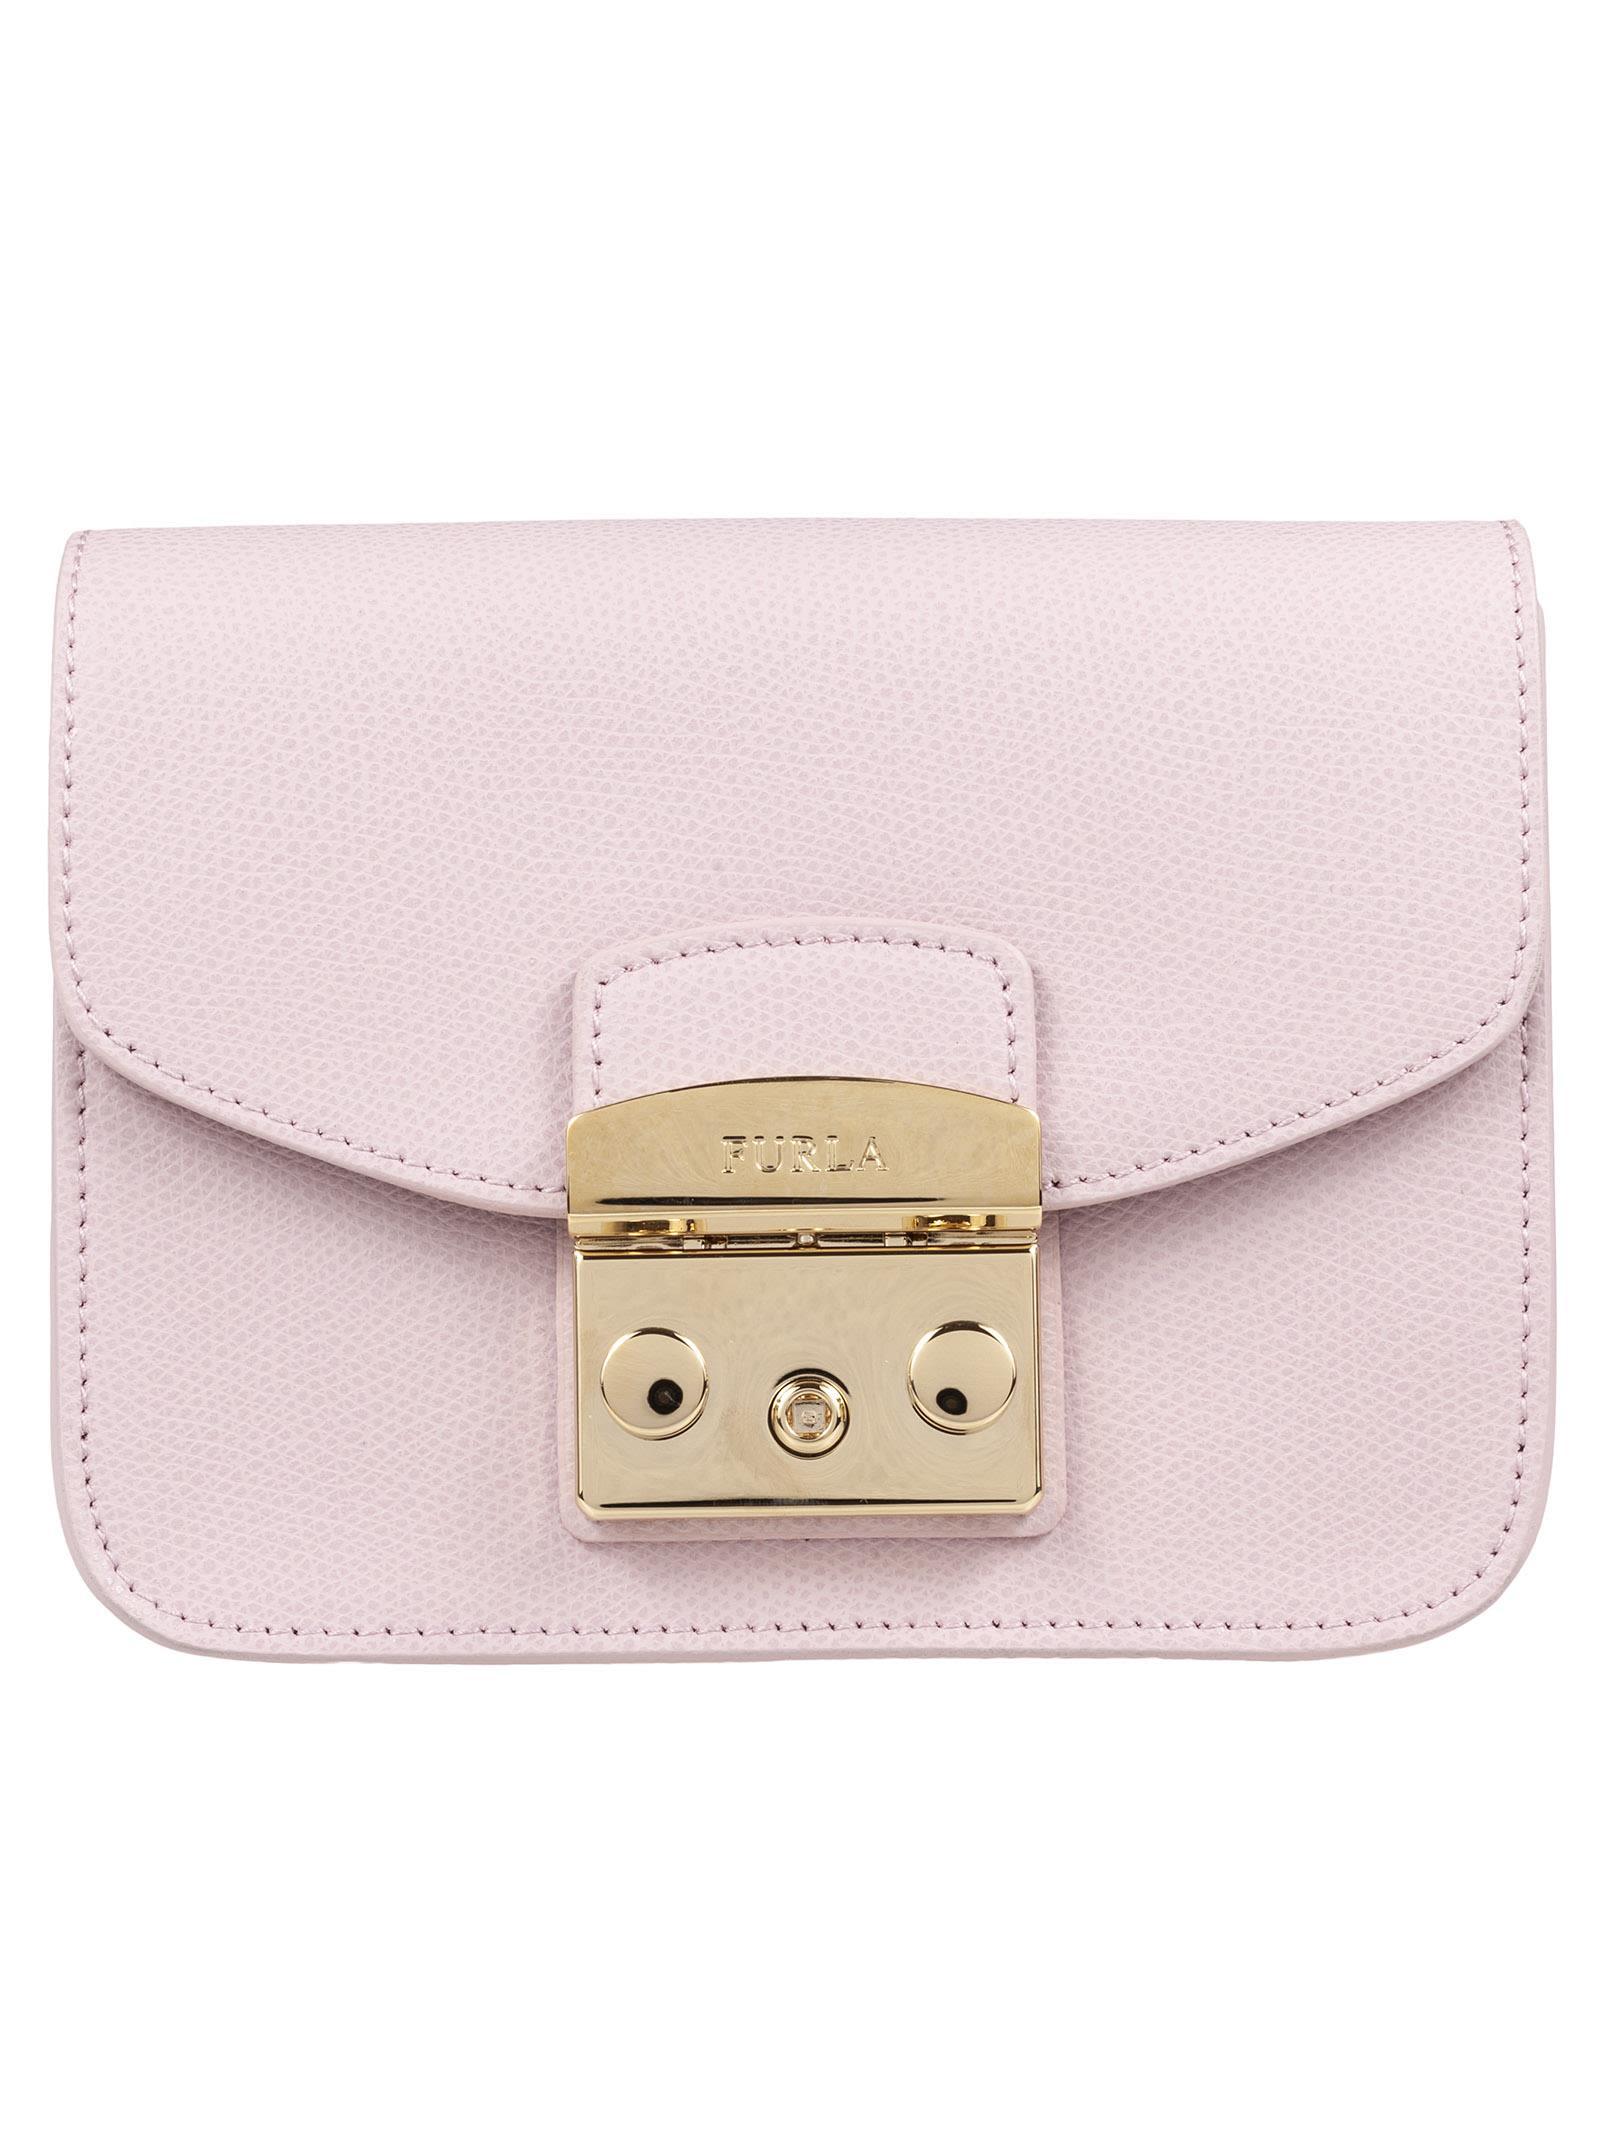 Italist Best Price In The Market For Furla Mini Metropolis Shoulder Bag Camelia